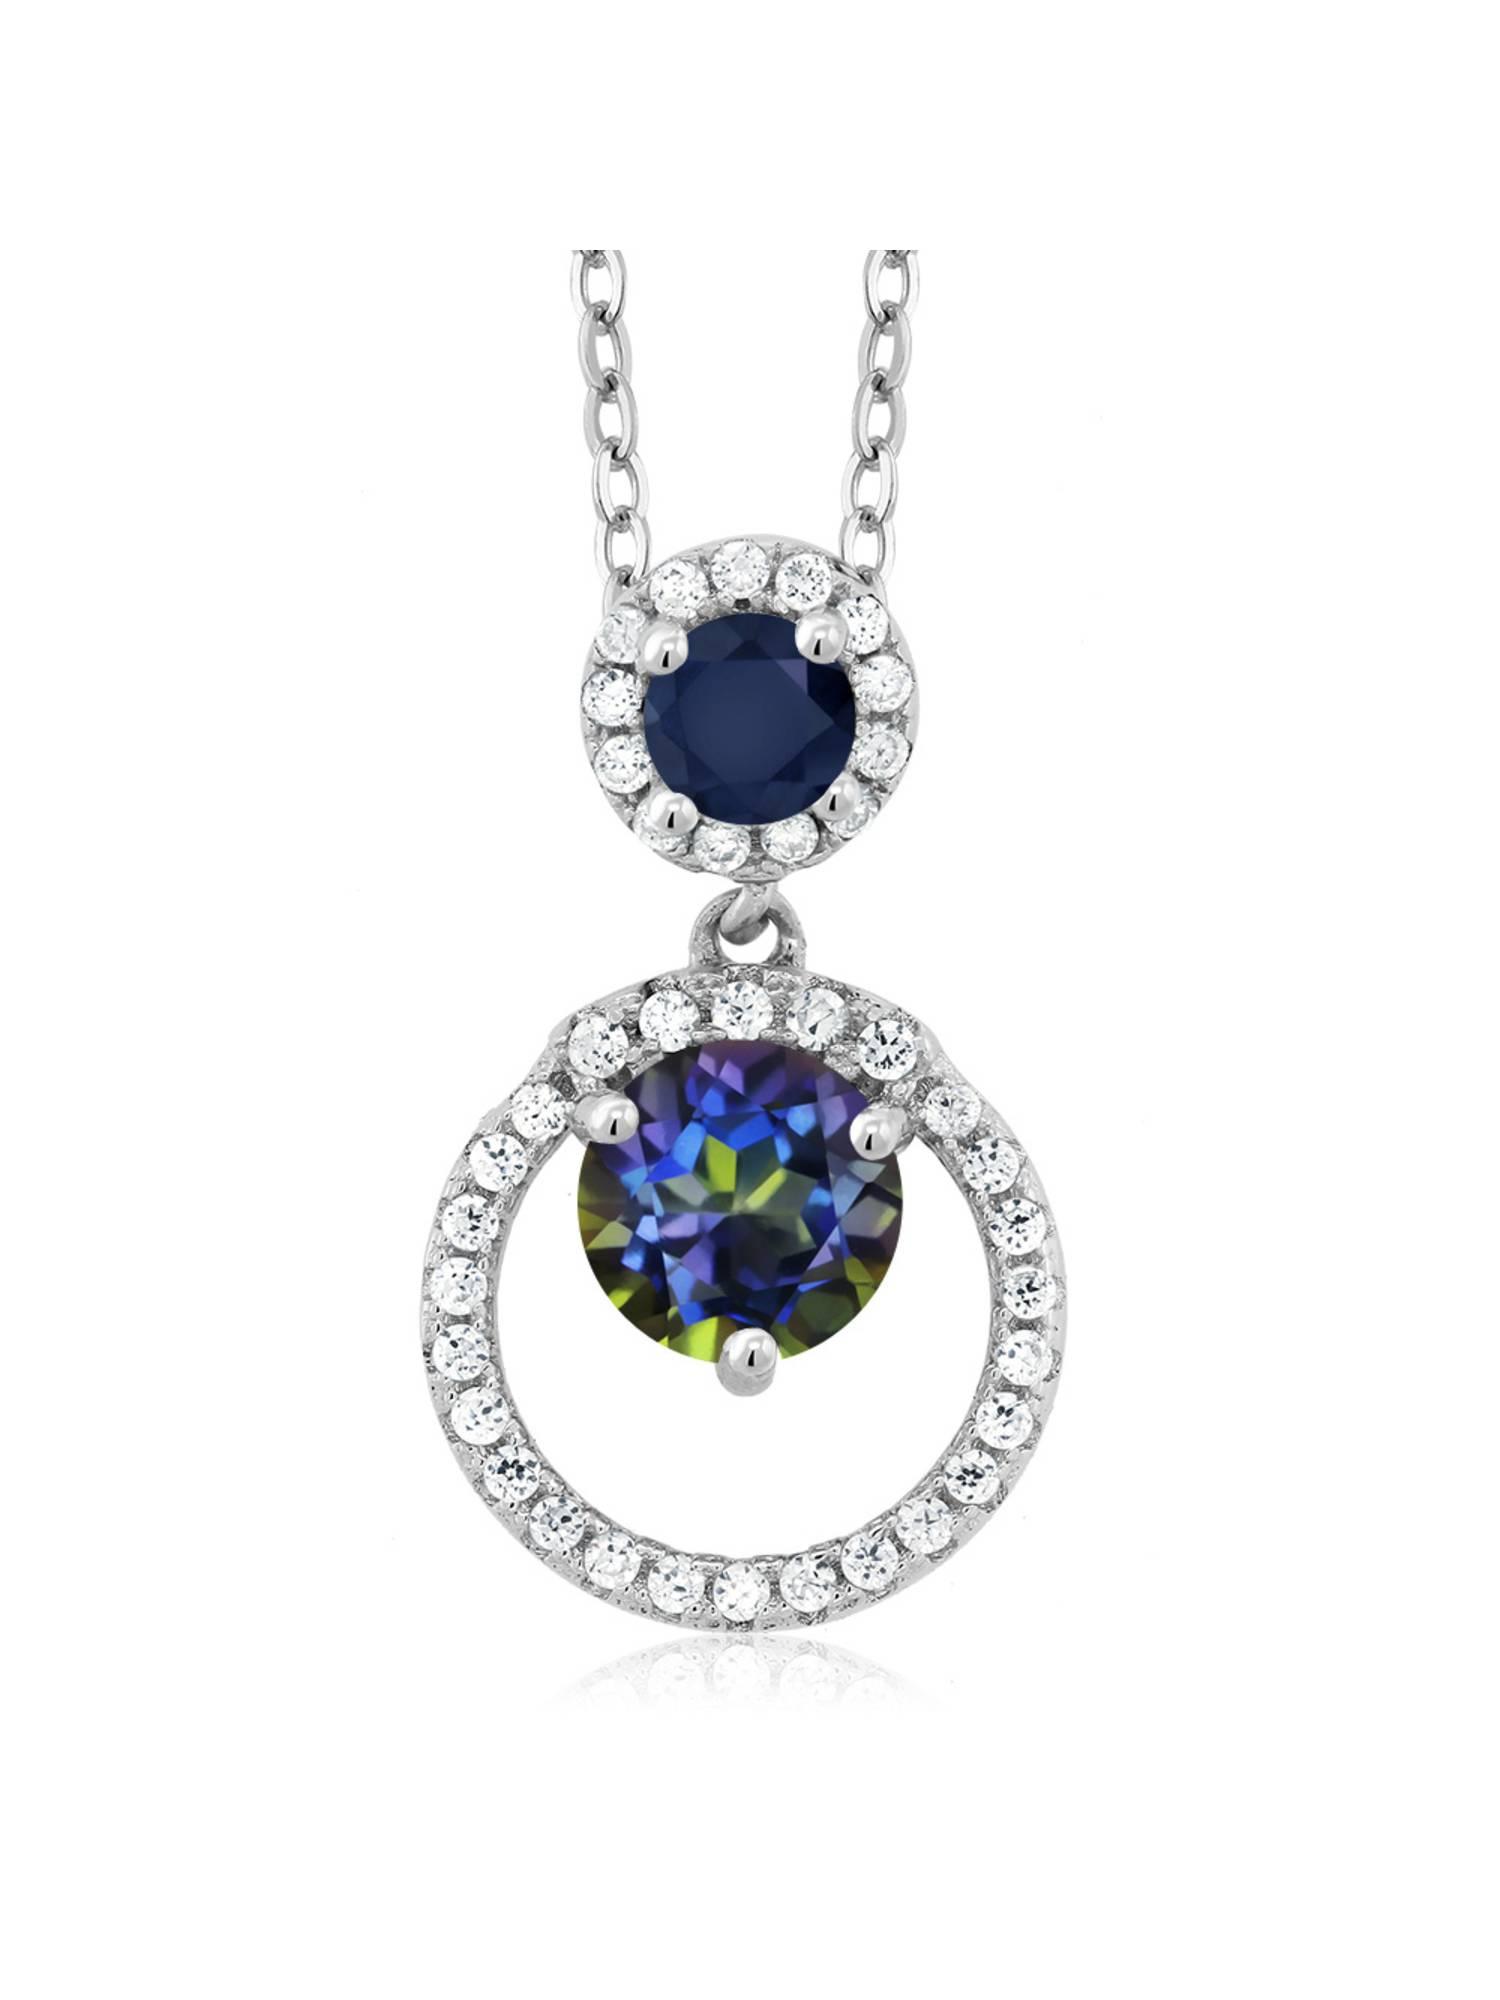 1.96 Ct Round Blue Mystic Topaz Blue Sapphire 925 Sterling